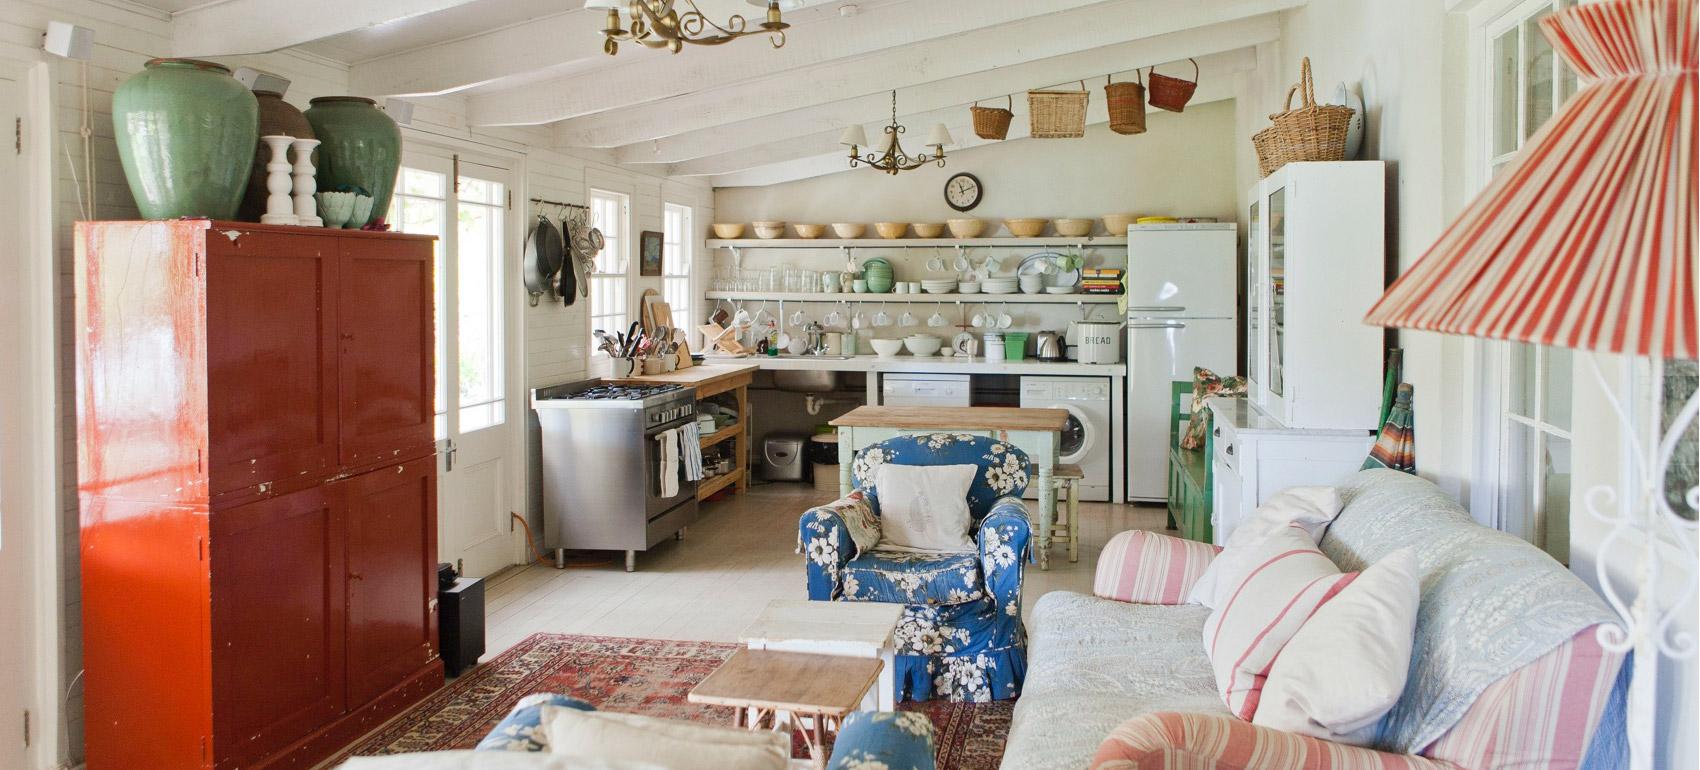 bloomsbury-cottage-gallery-04